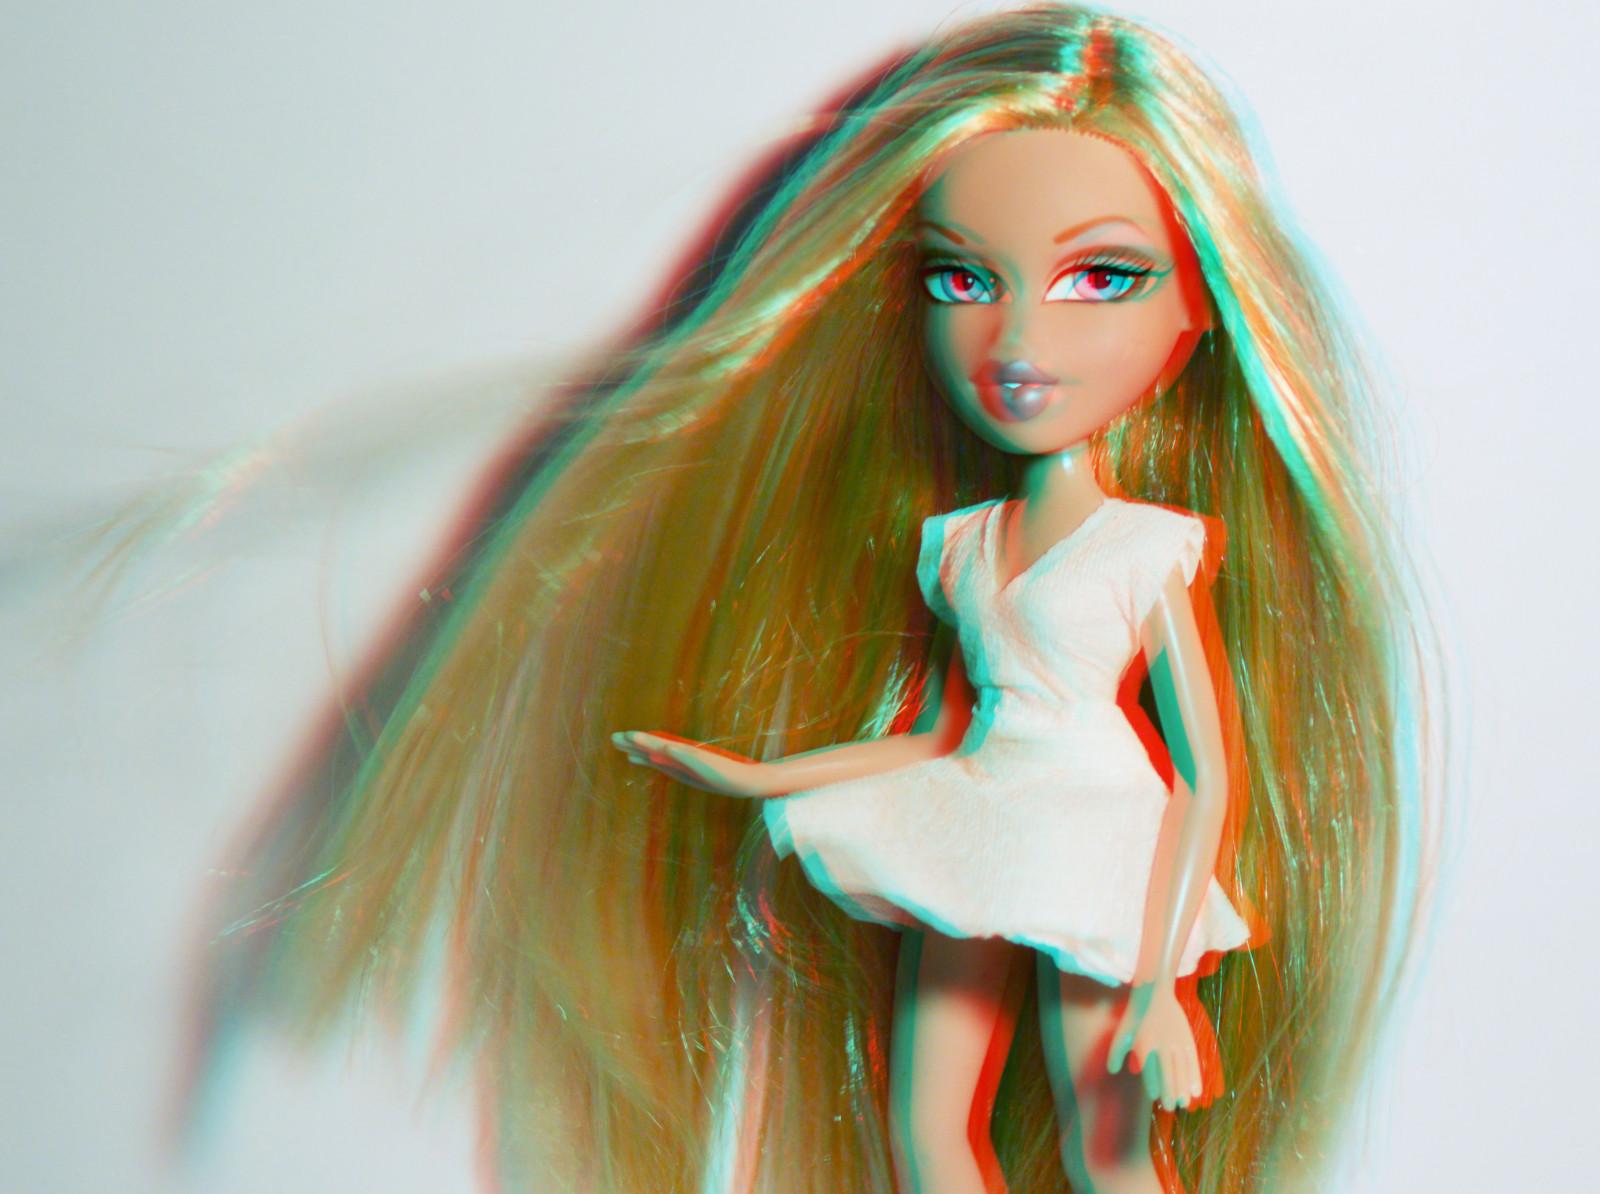 Hintergrundbilder Blond Lange Haare 3d Mode Pony Bräunen